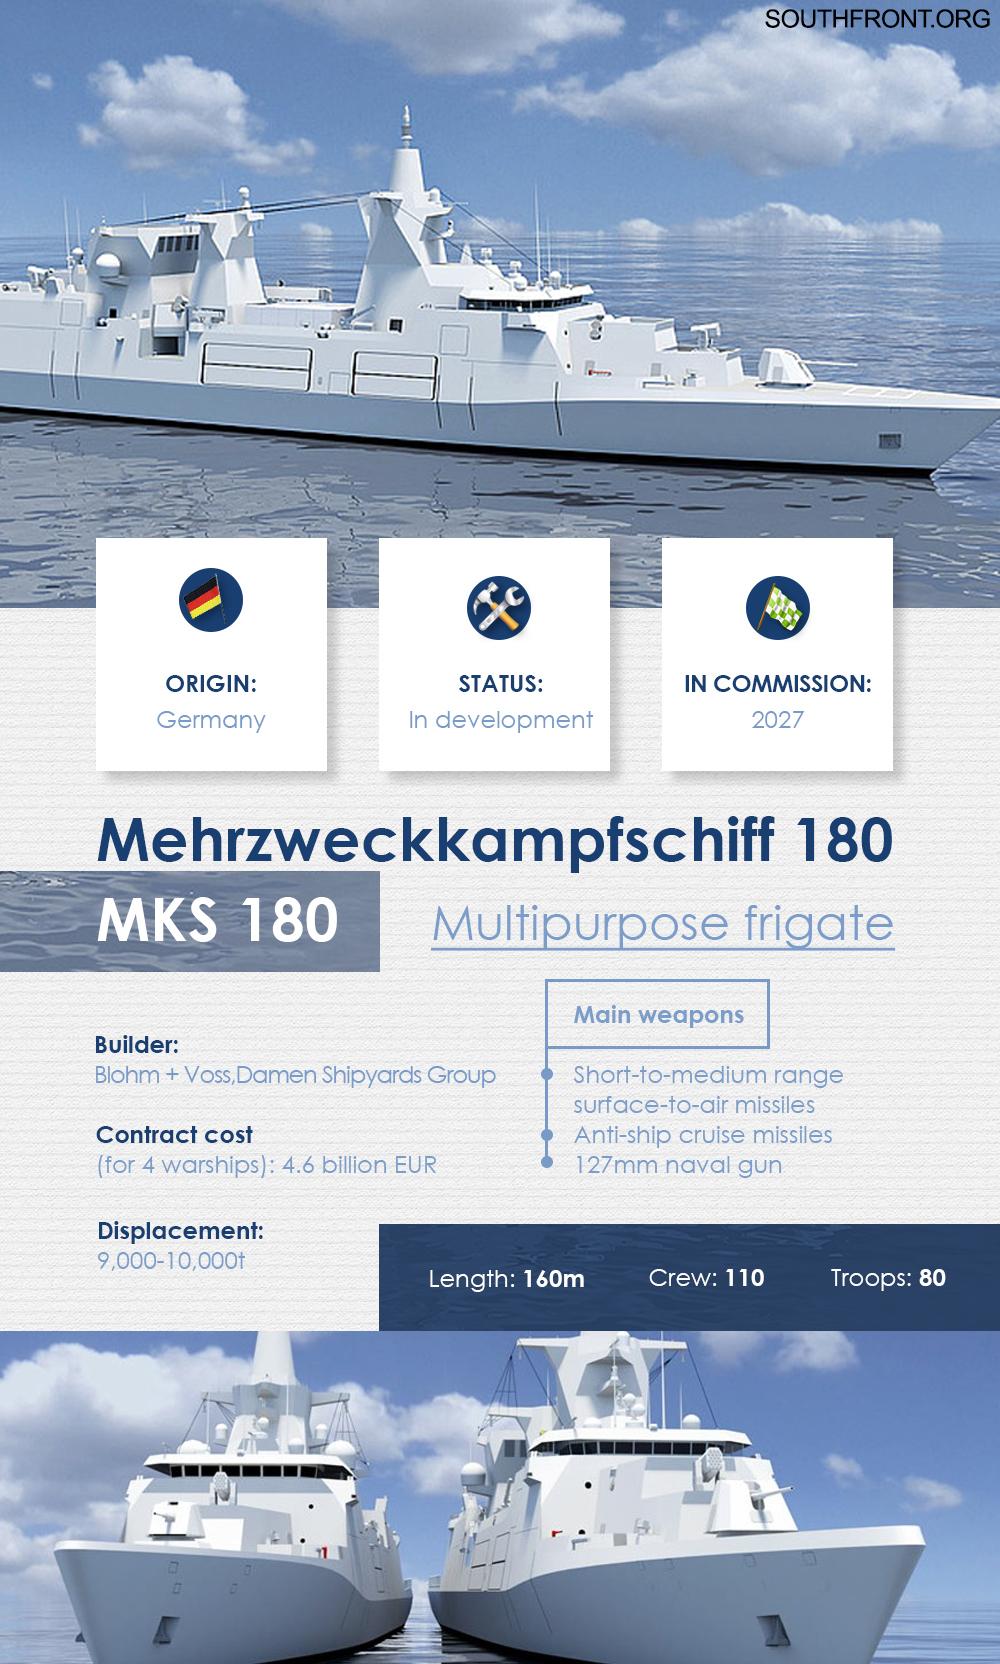 Mehrzweckkampfschiff 180 (MKS 180) Frigate (Infographics)